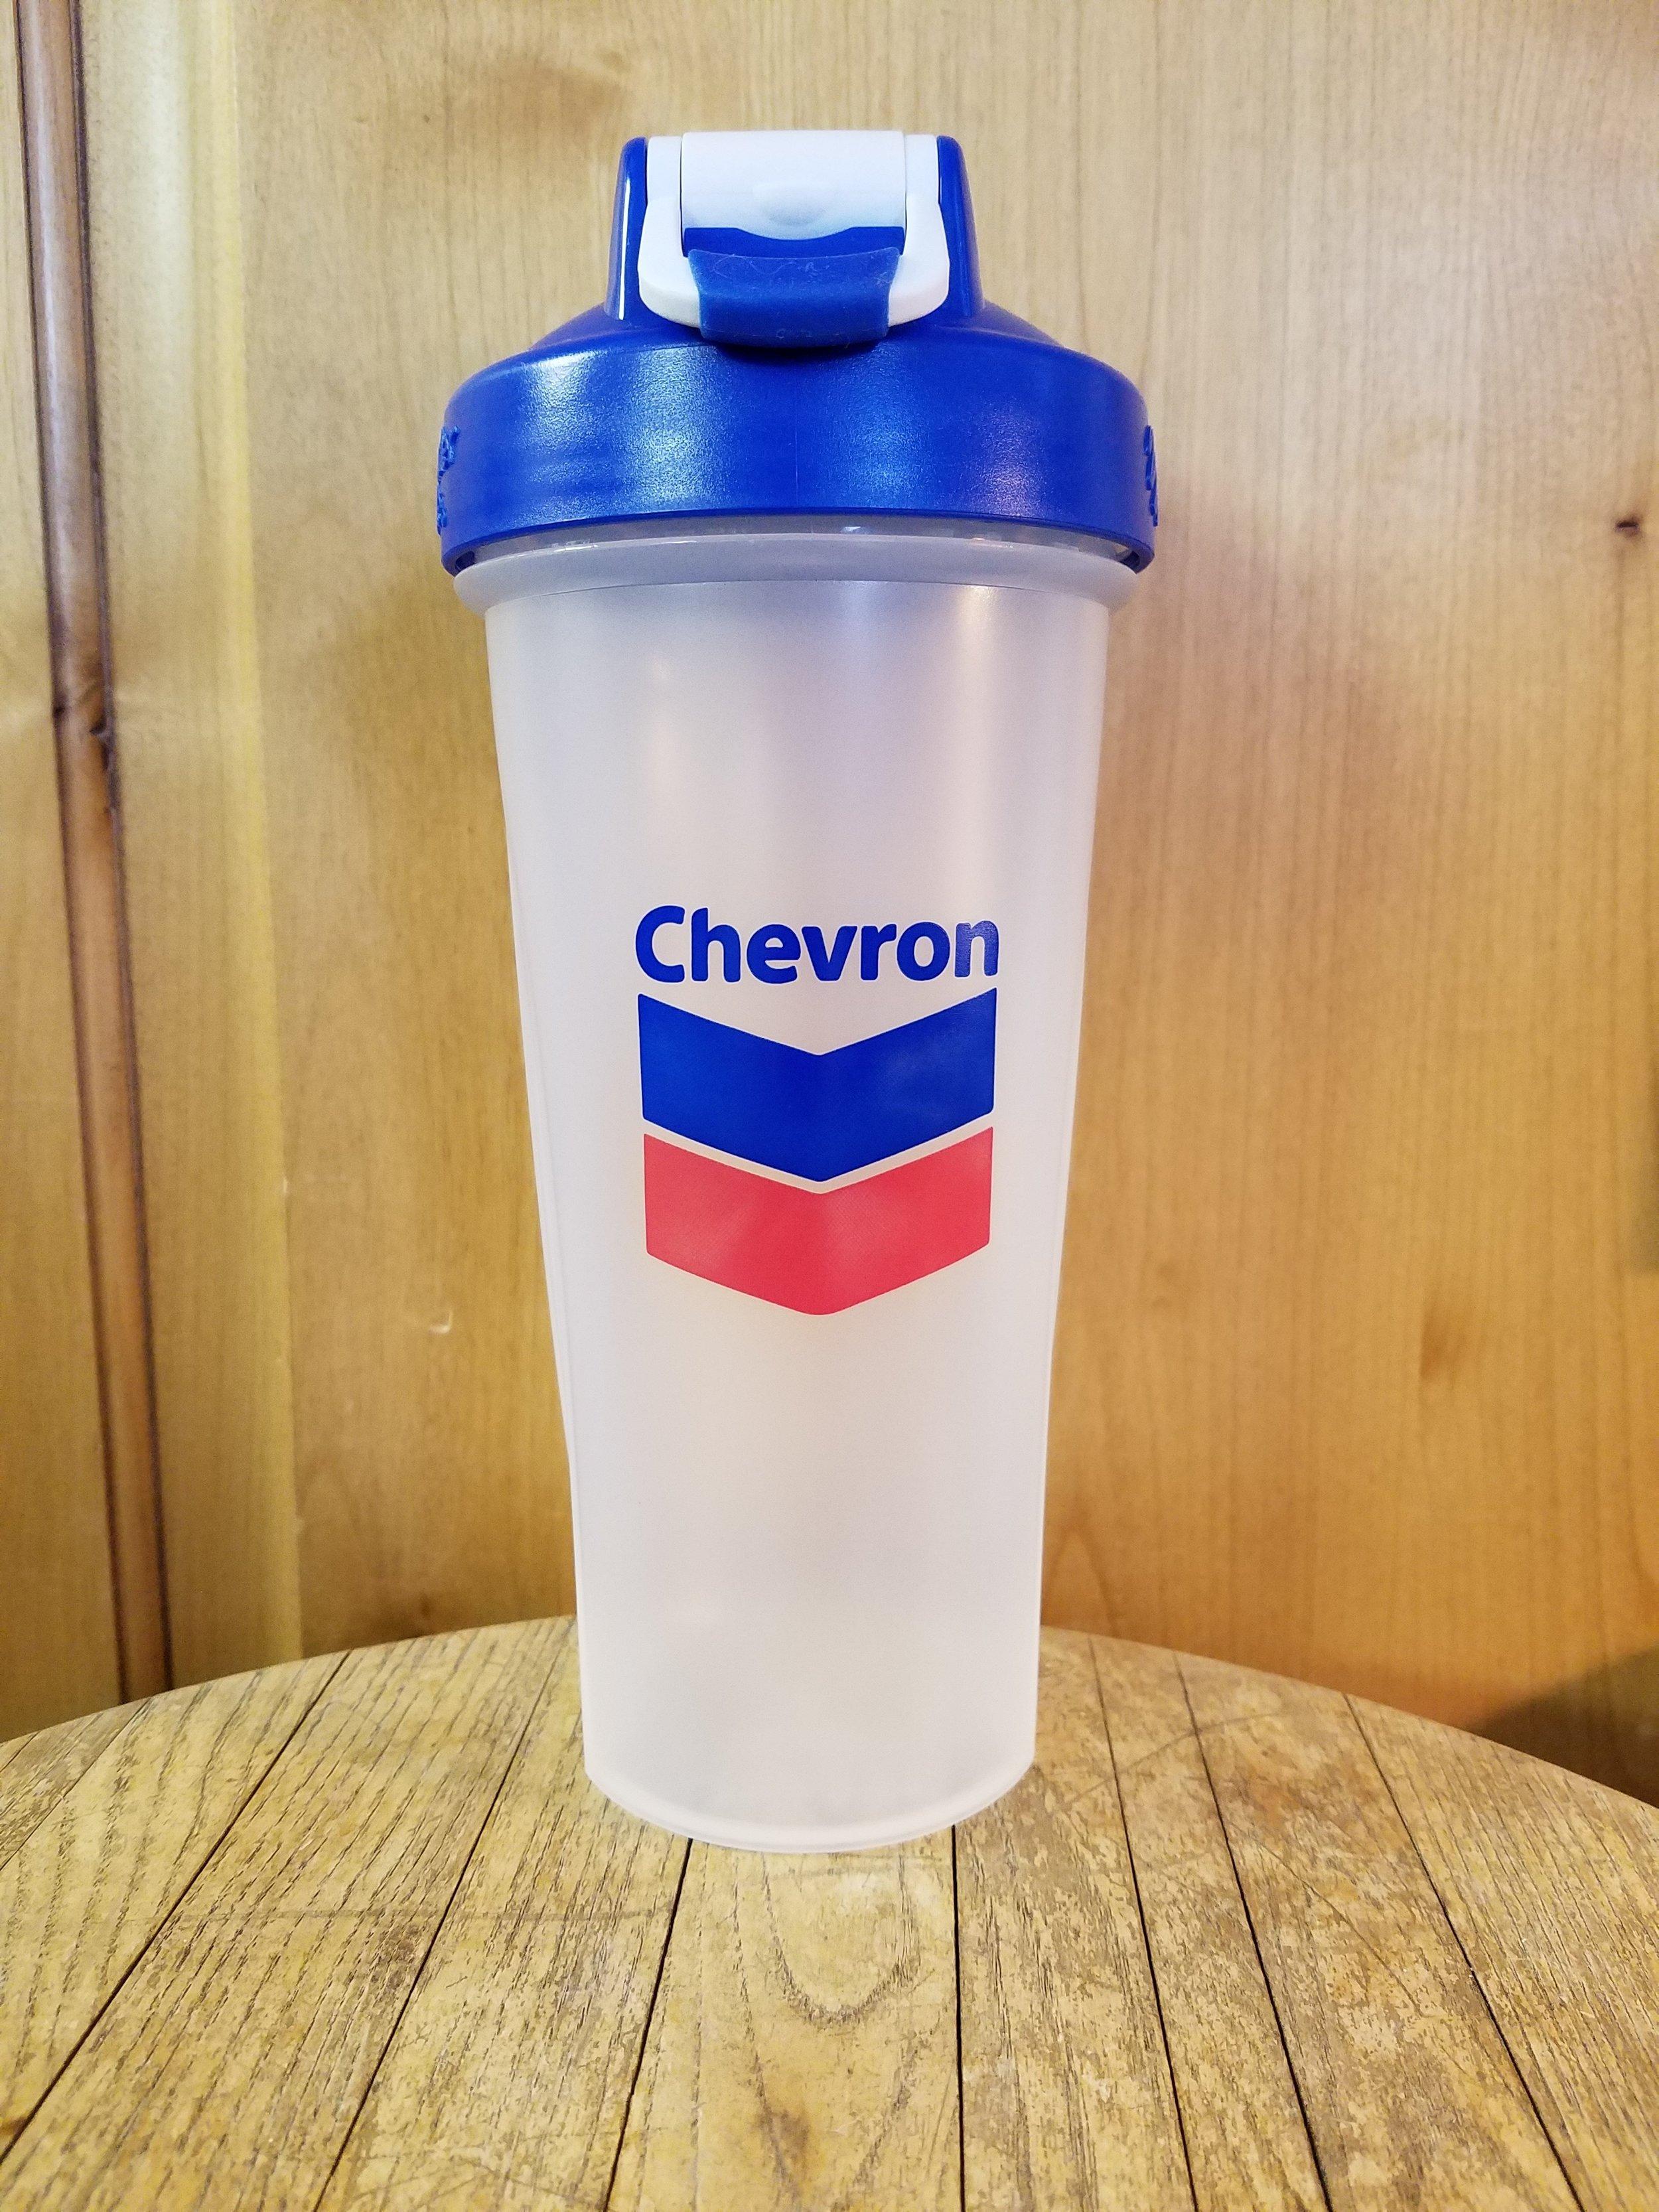 Chevron bottle.jpg